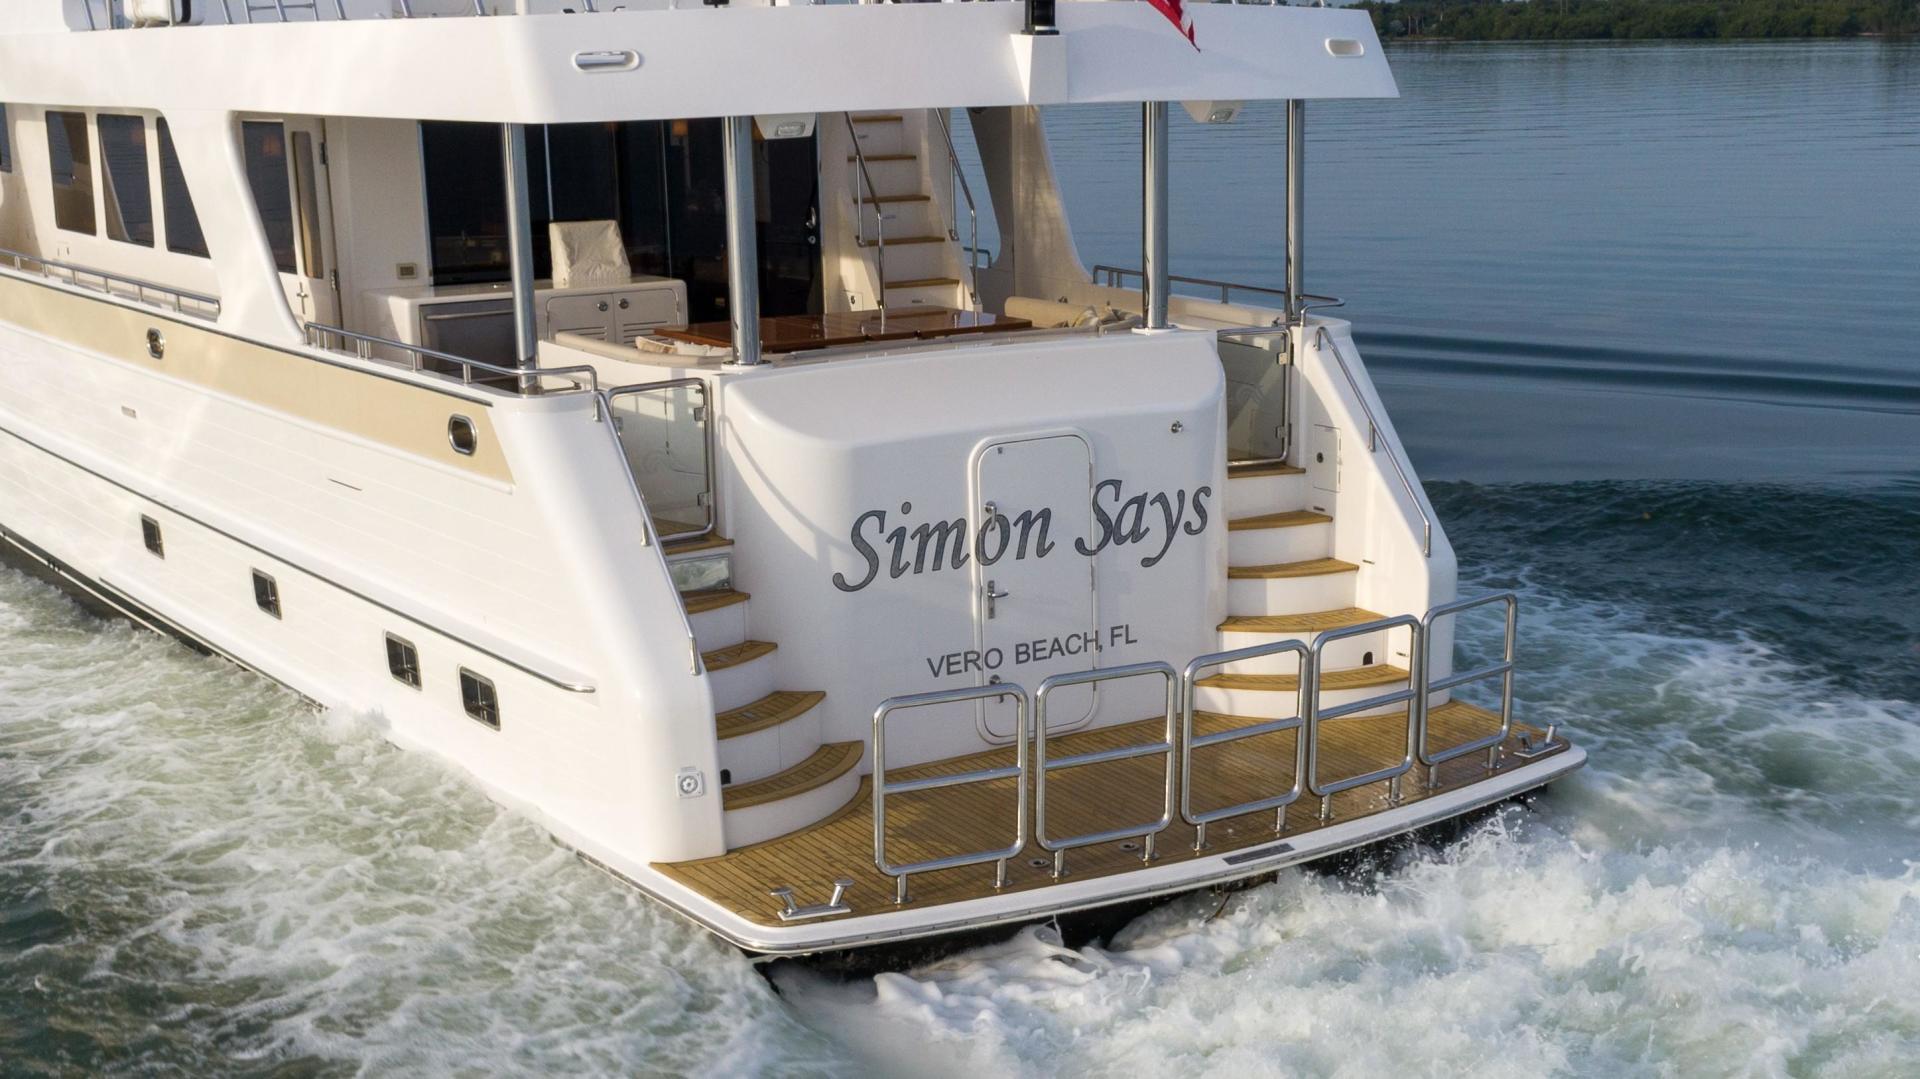 Outer Reef Yachts-860 DBMY 2017-Simon Says Vero Beach-Florida-United States-1488228 | Thumbnail